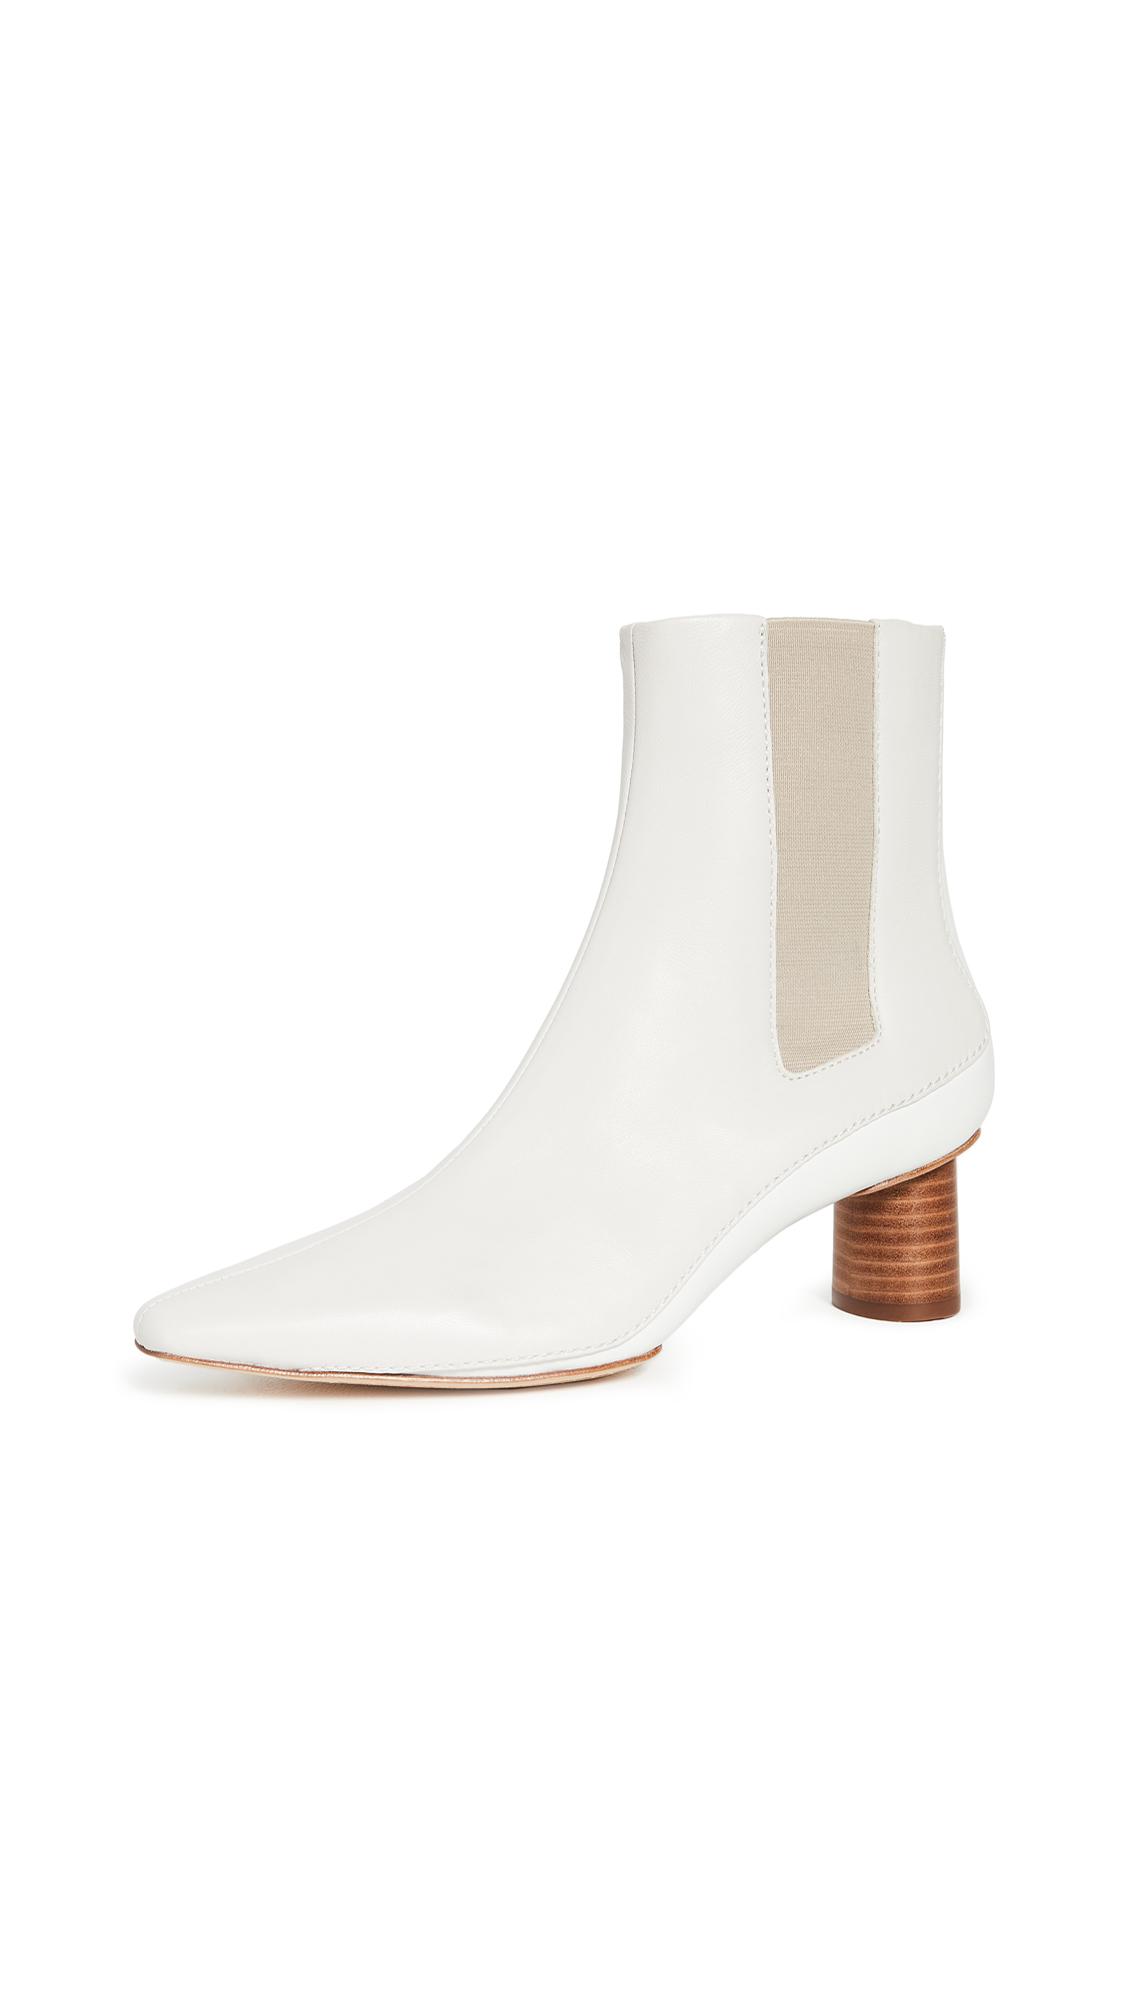 Rag & Bone Jet Chelsea Boots – 50% Off Sale